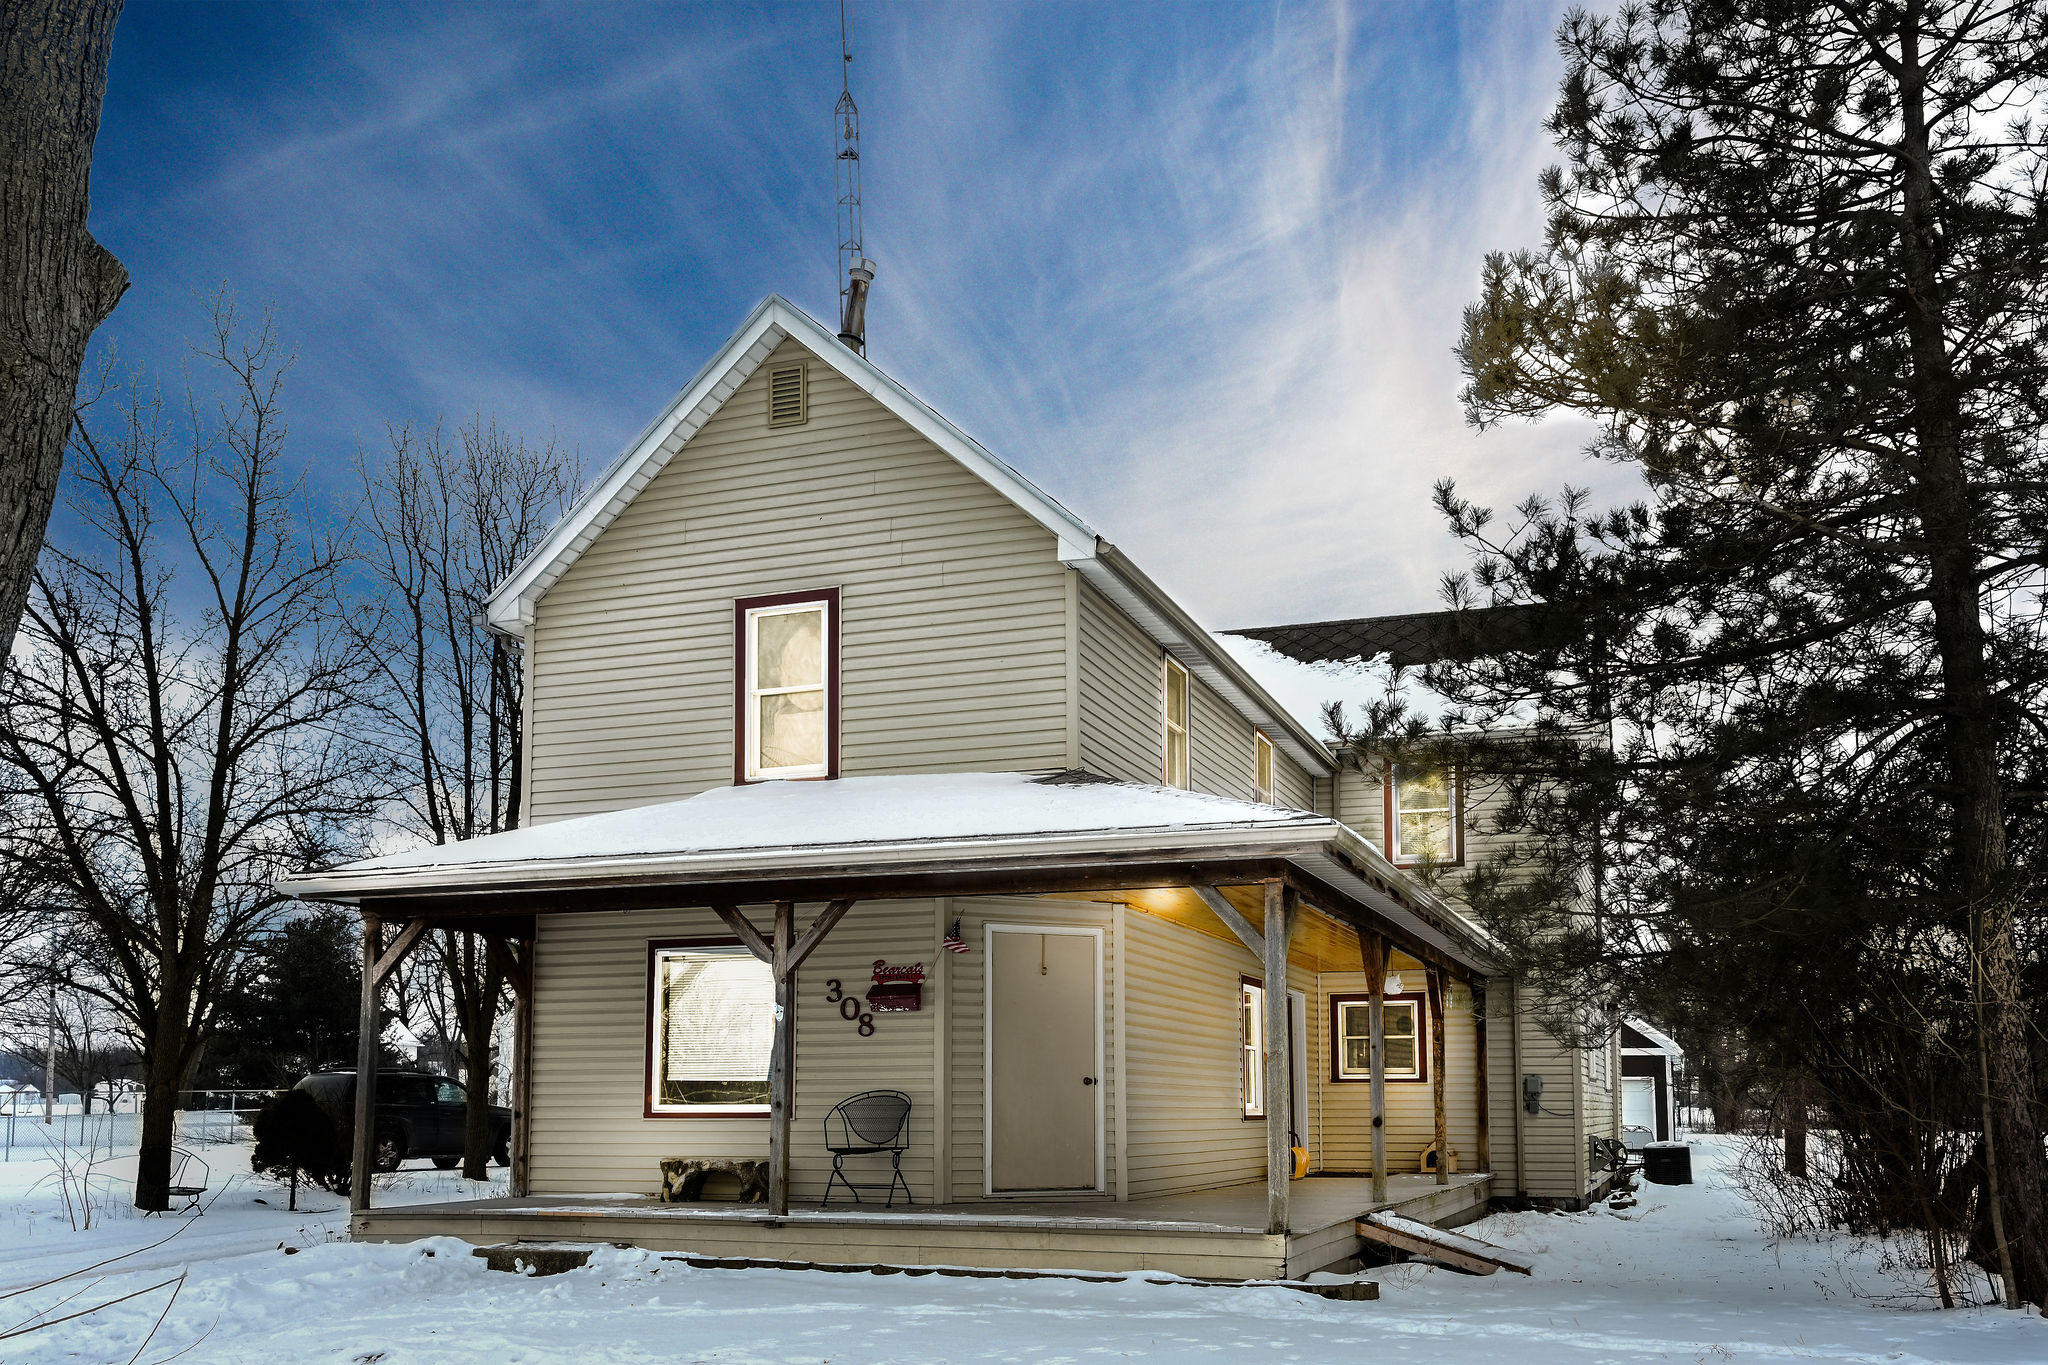 Elizabeth Meihls Sub Real Estate Listings Main Image